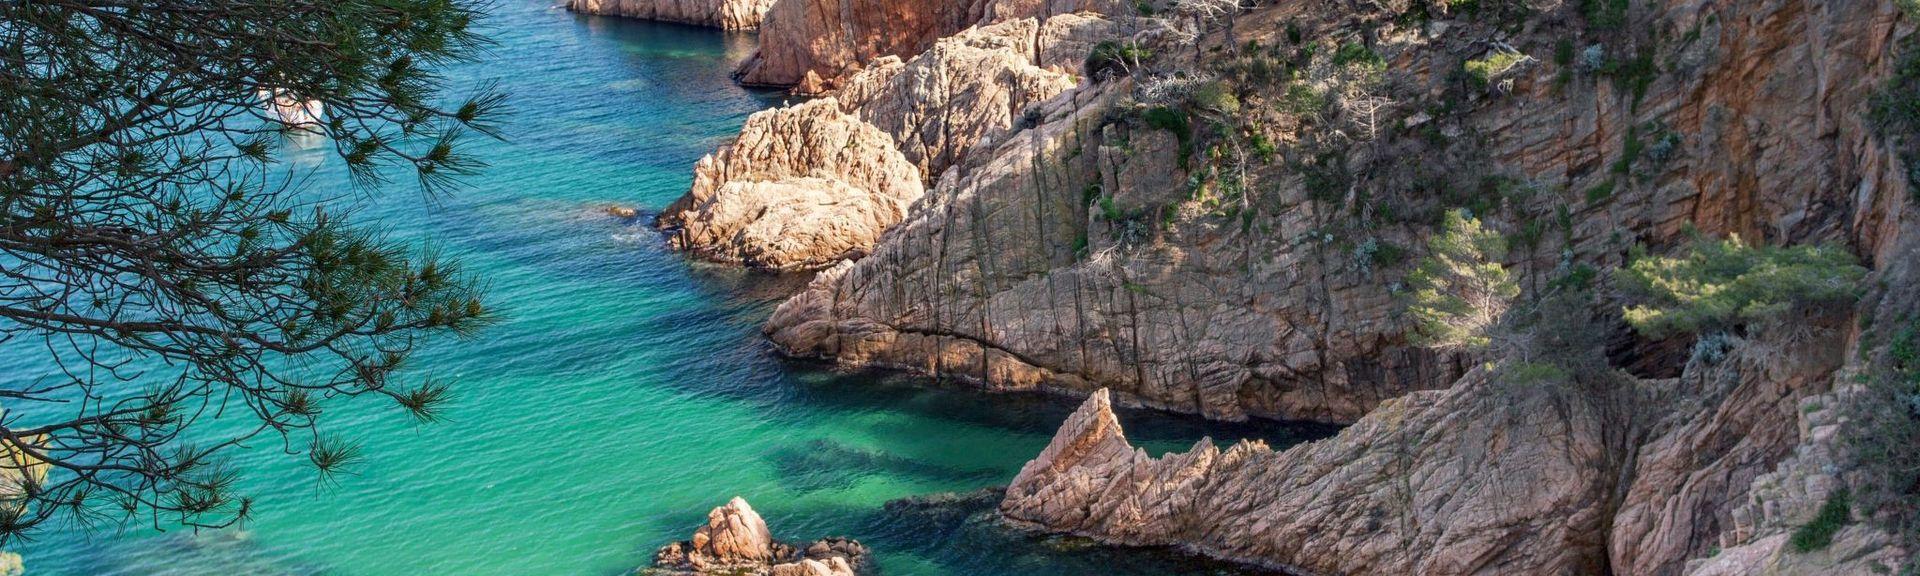 Selva, Espagne